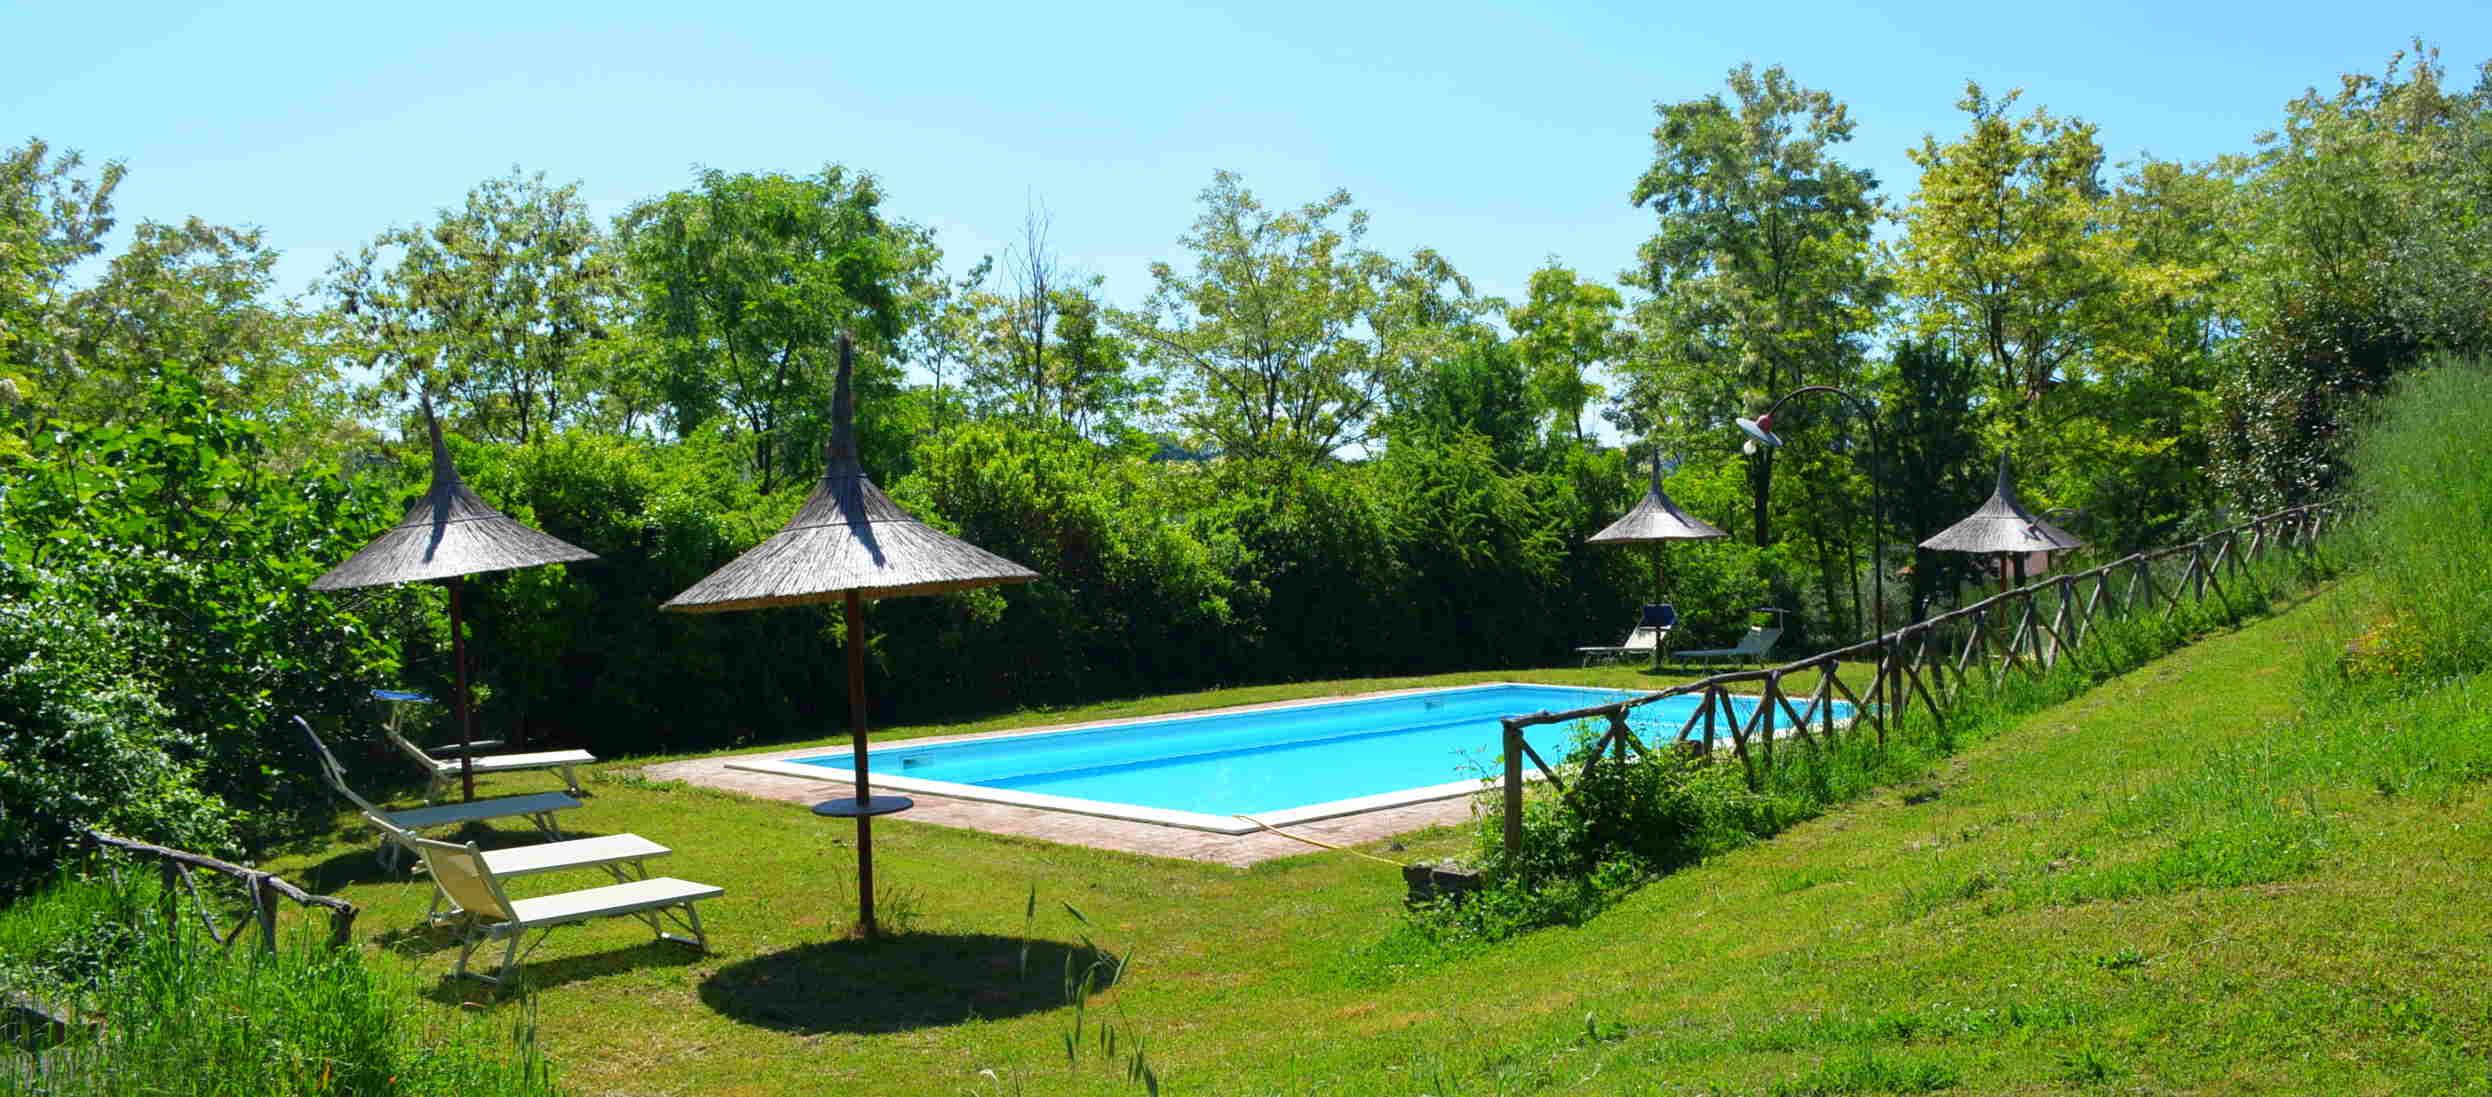 Agriturismo appartamenti umbria b b appartamenti per - B b umbria con piscina ...